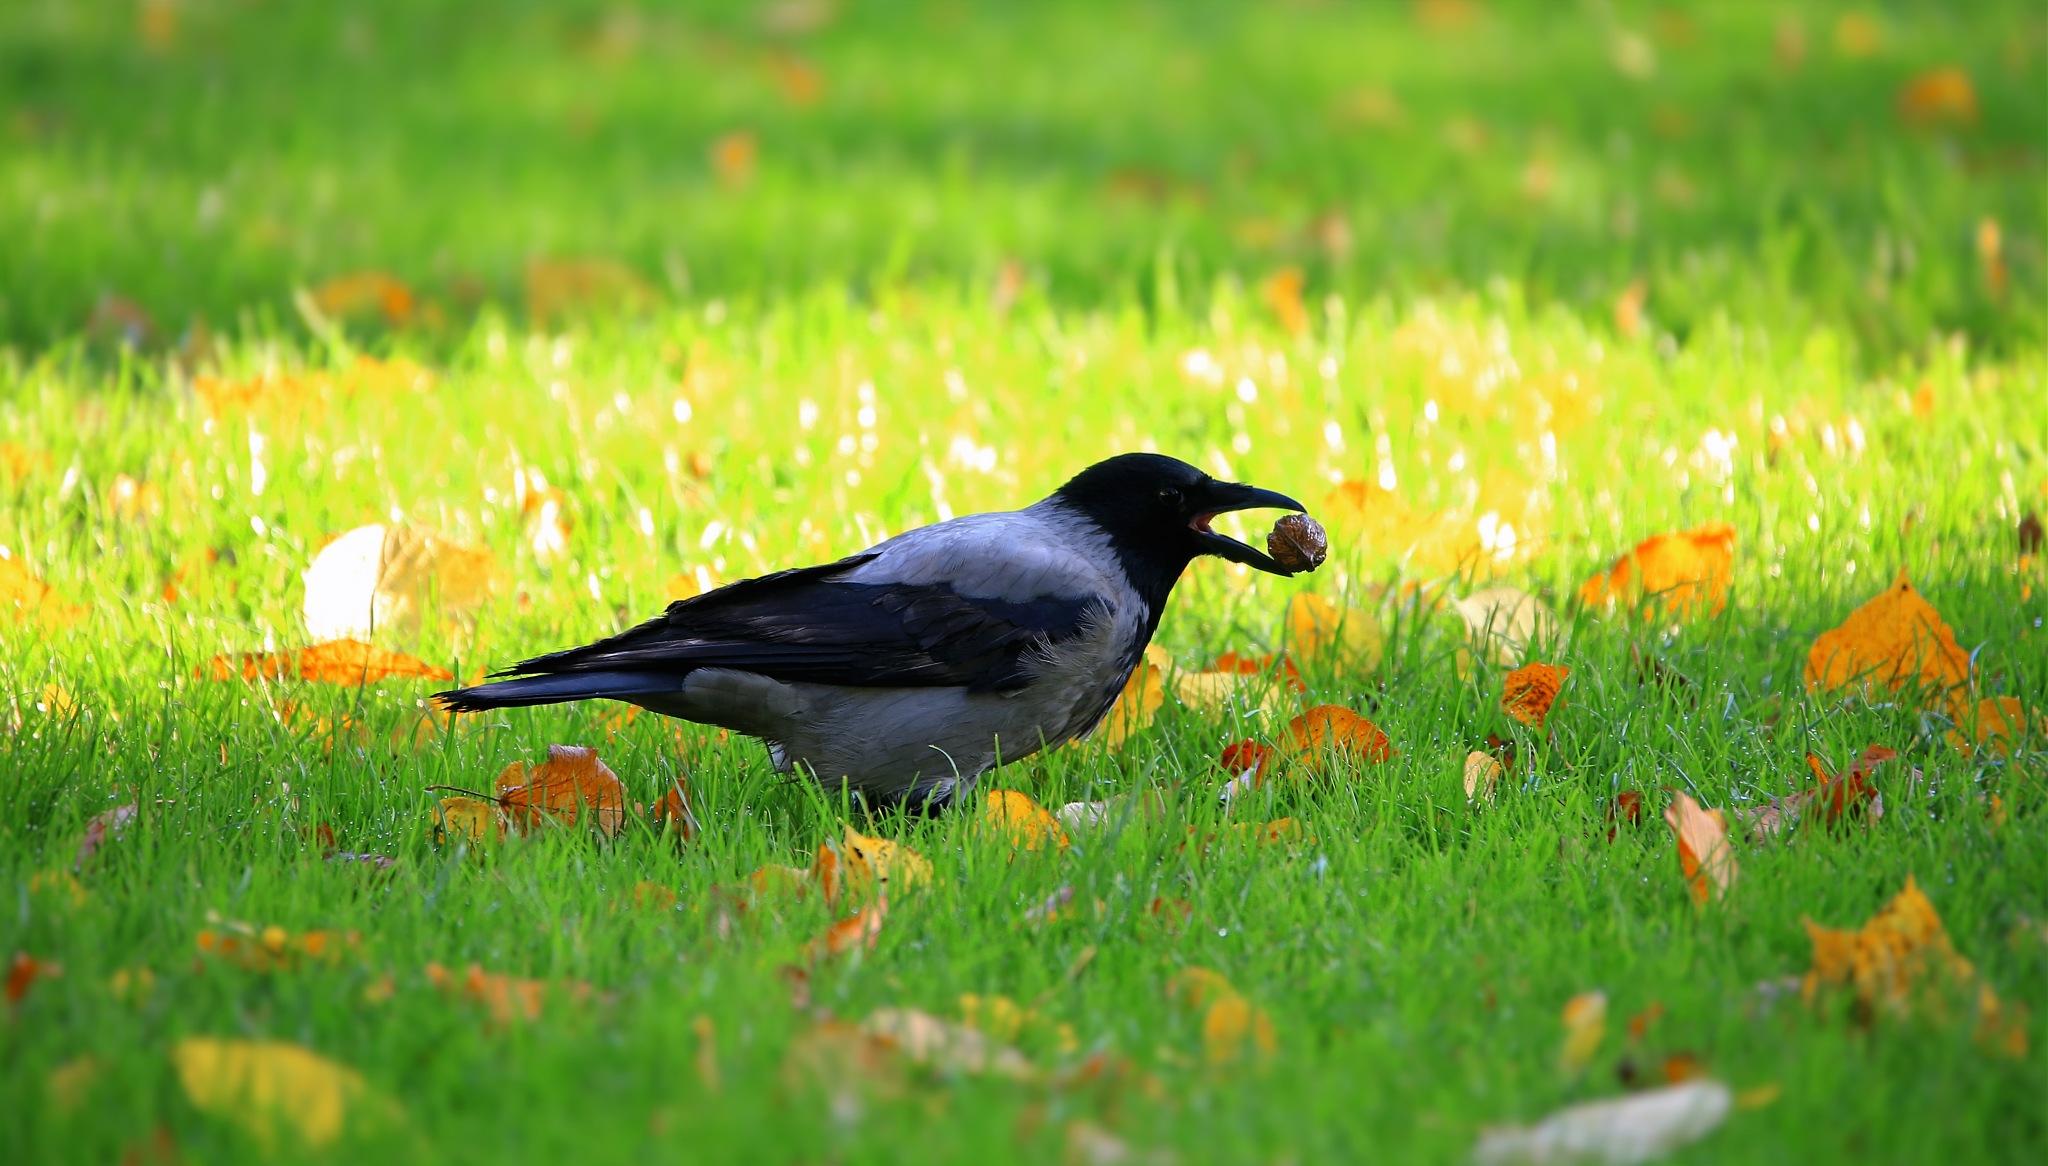 Crow by abi.doroud